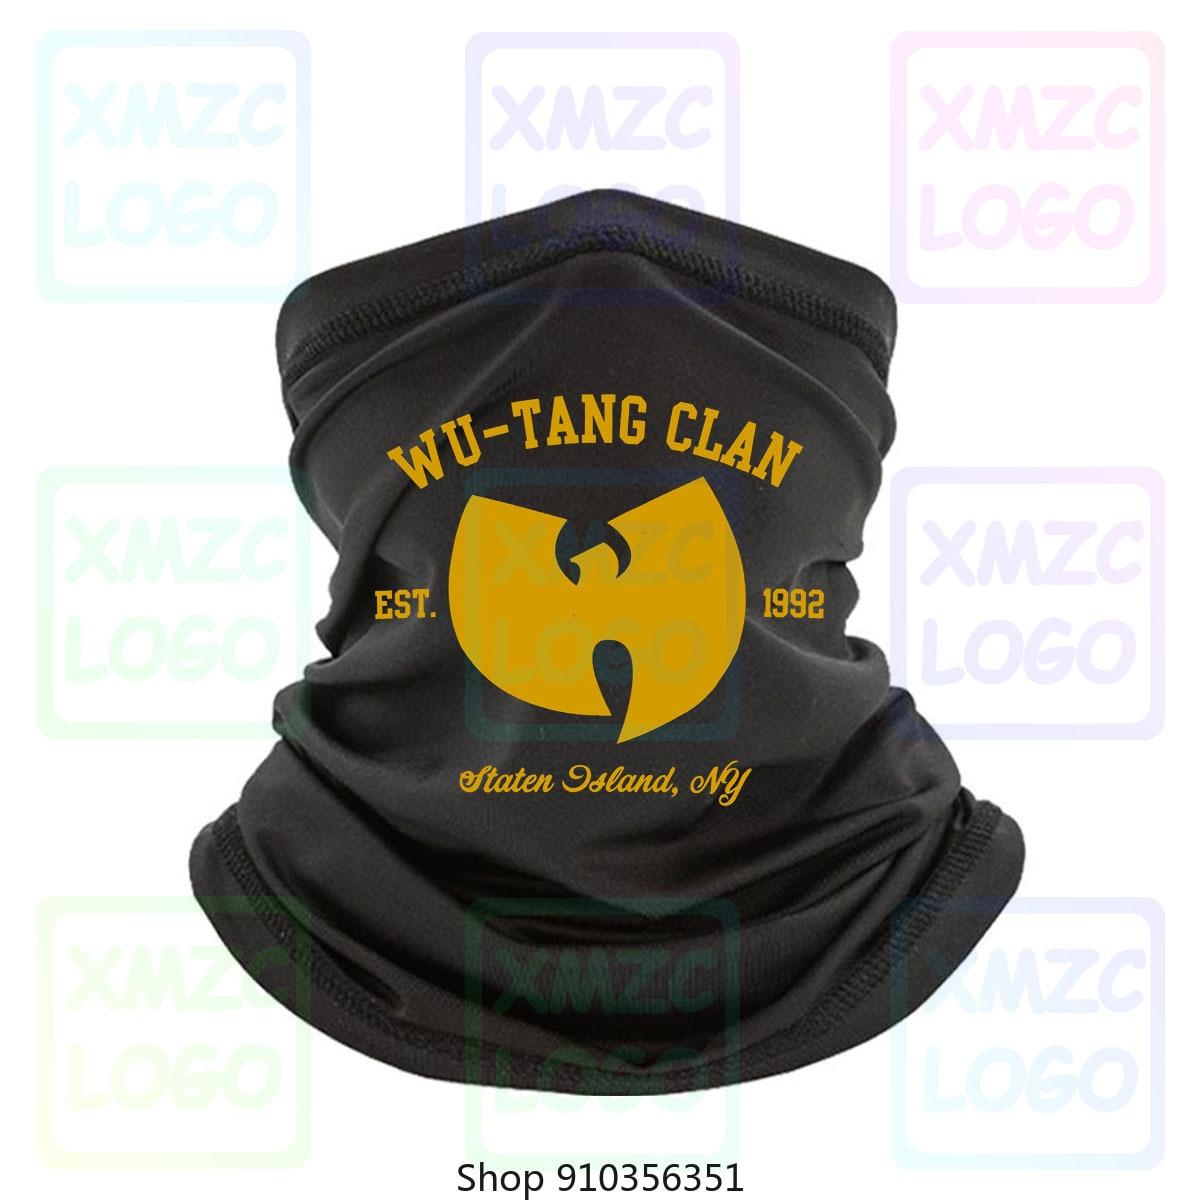 Wu Tang Clan t-shirt t-shirt Hip Hop Mc Rza Gza Odb méthode homme Raekwon Rap hommes bandeau écharpe Bandana cou plus chaud femmes hommes